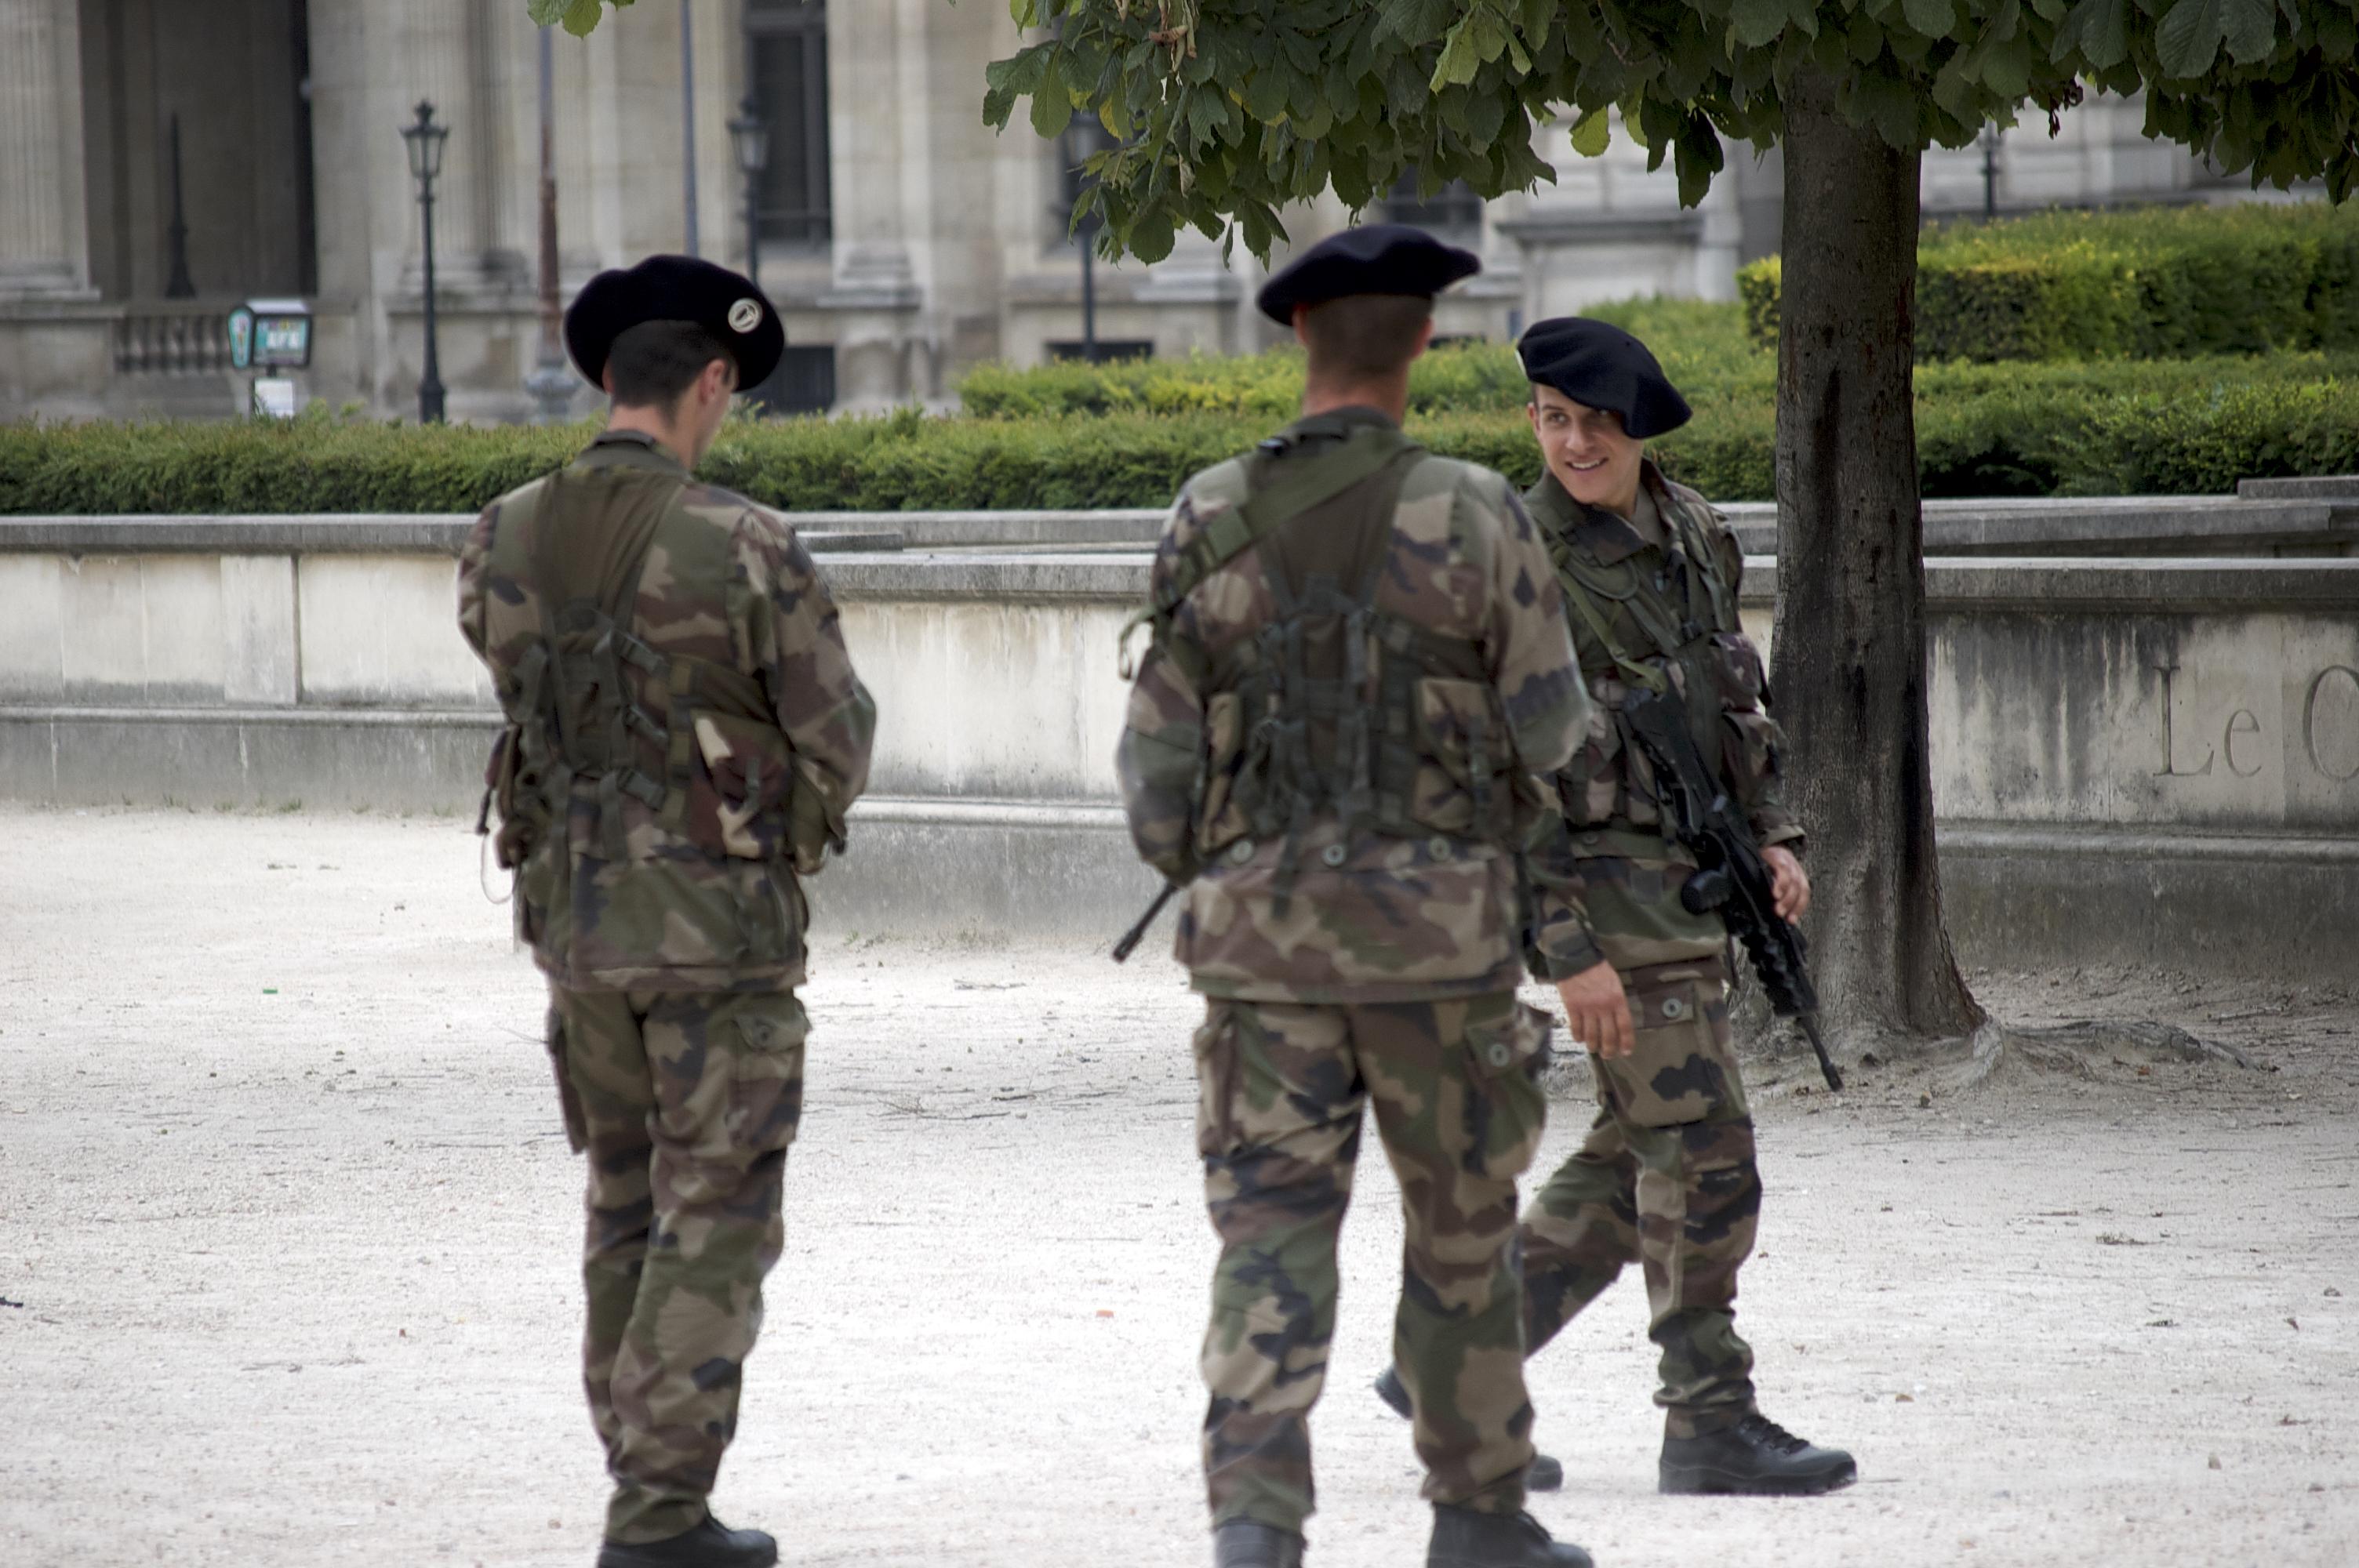 Soldiers_Paris-DSC_0118.jpg